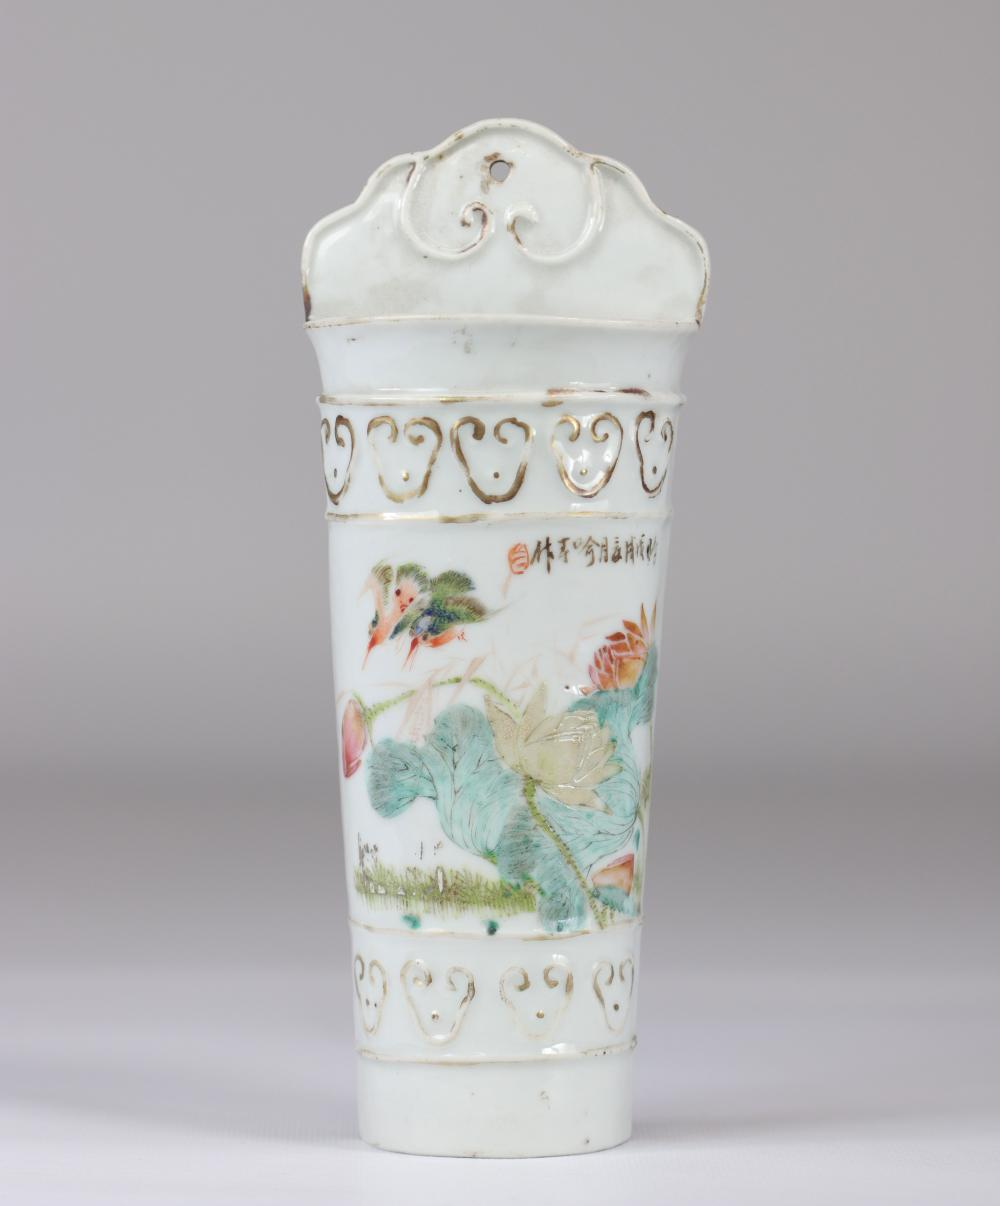 Porcelain hanging vase in Qianjiang China enamel circa 1900 Sizes: H=240mm L=95mm Weight (